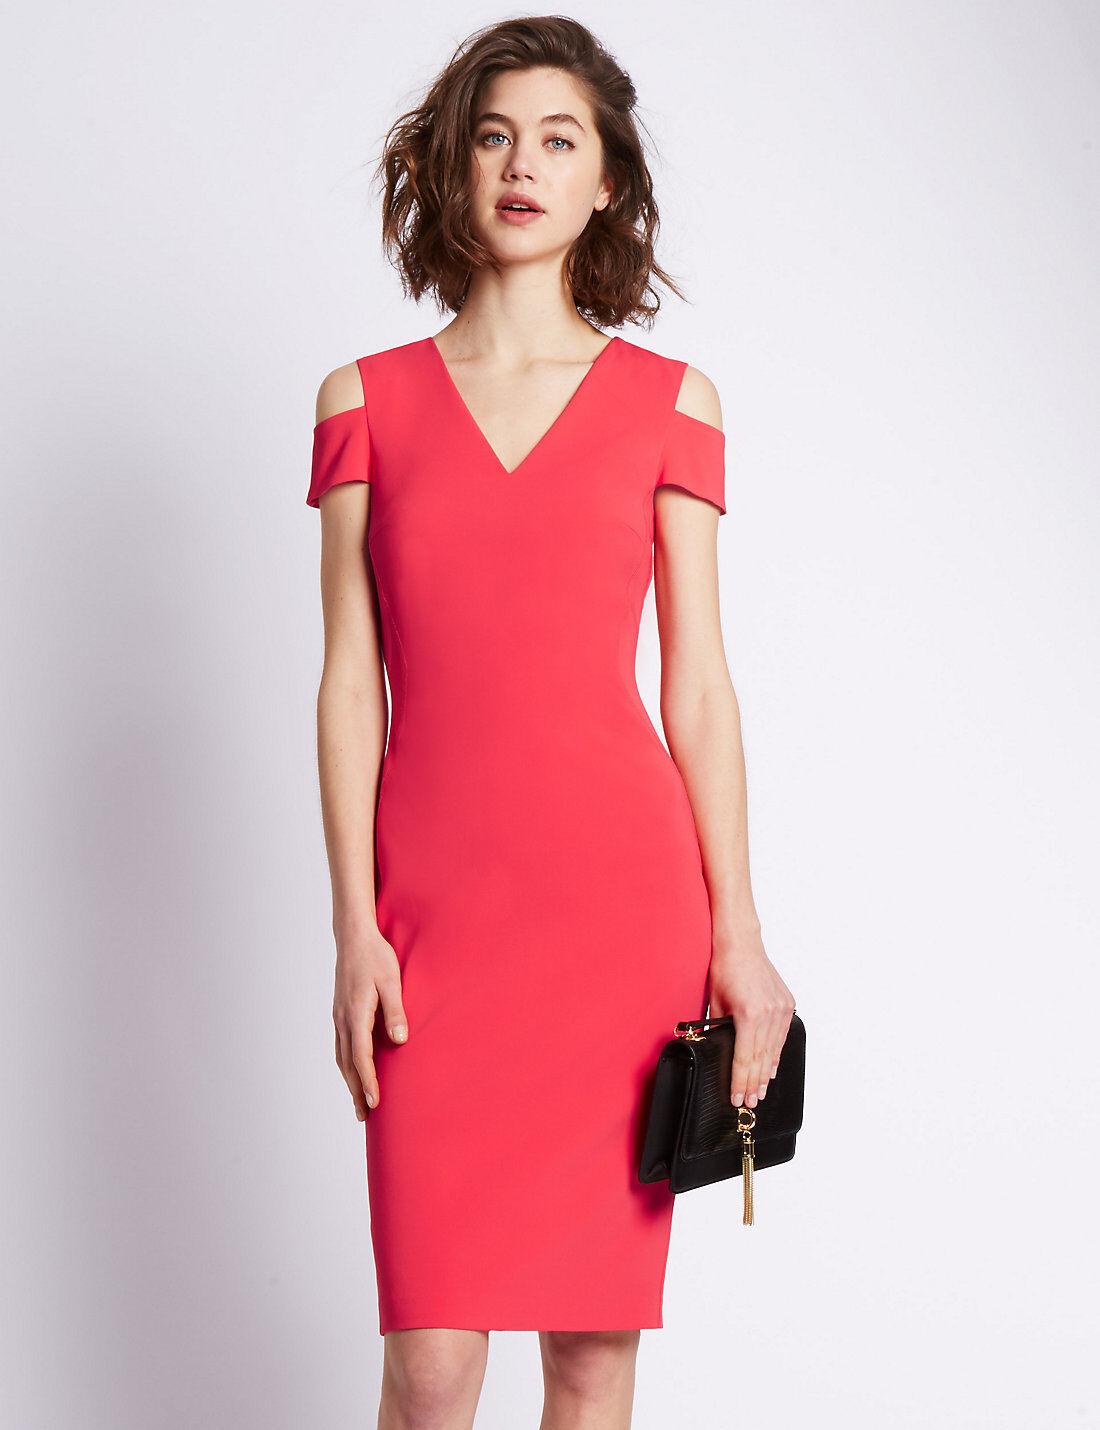 New M&S Per Una Speziale Pink Cold Shoulder Dress Sz